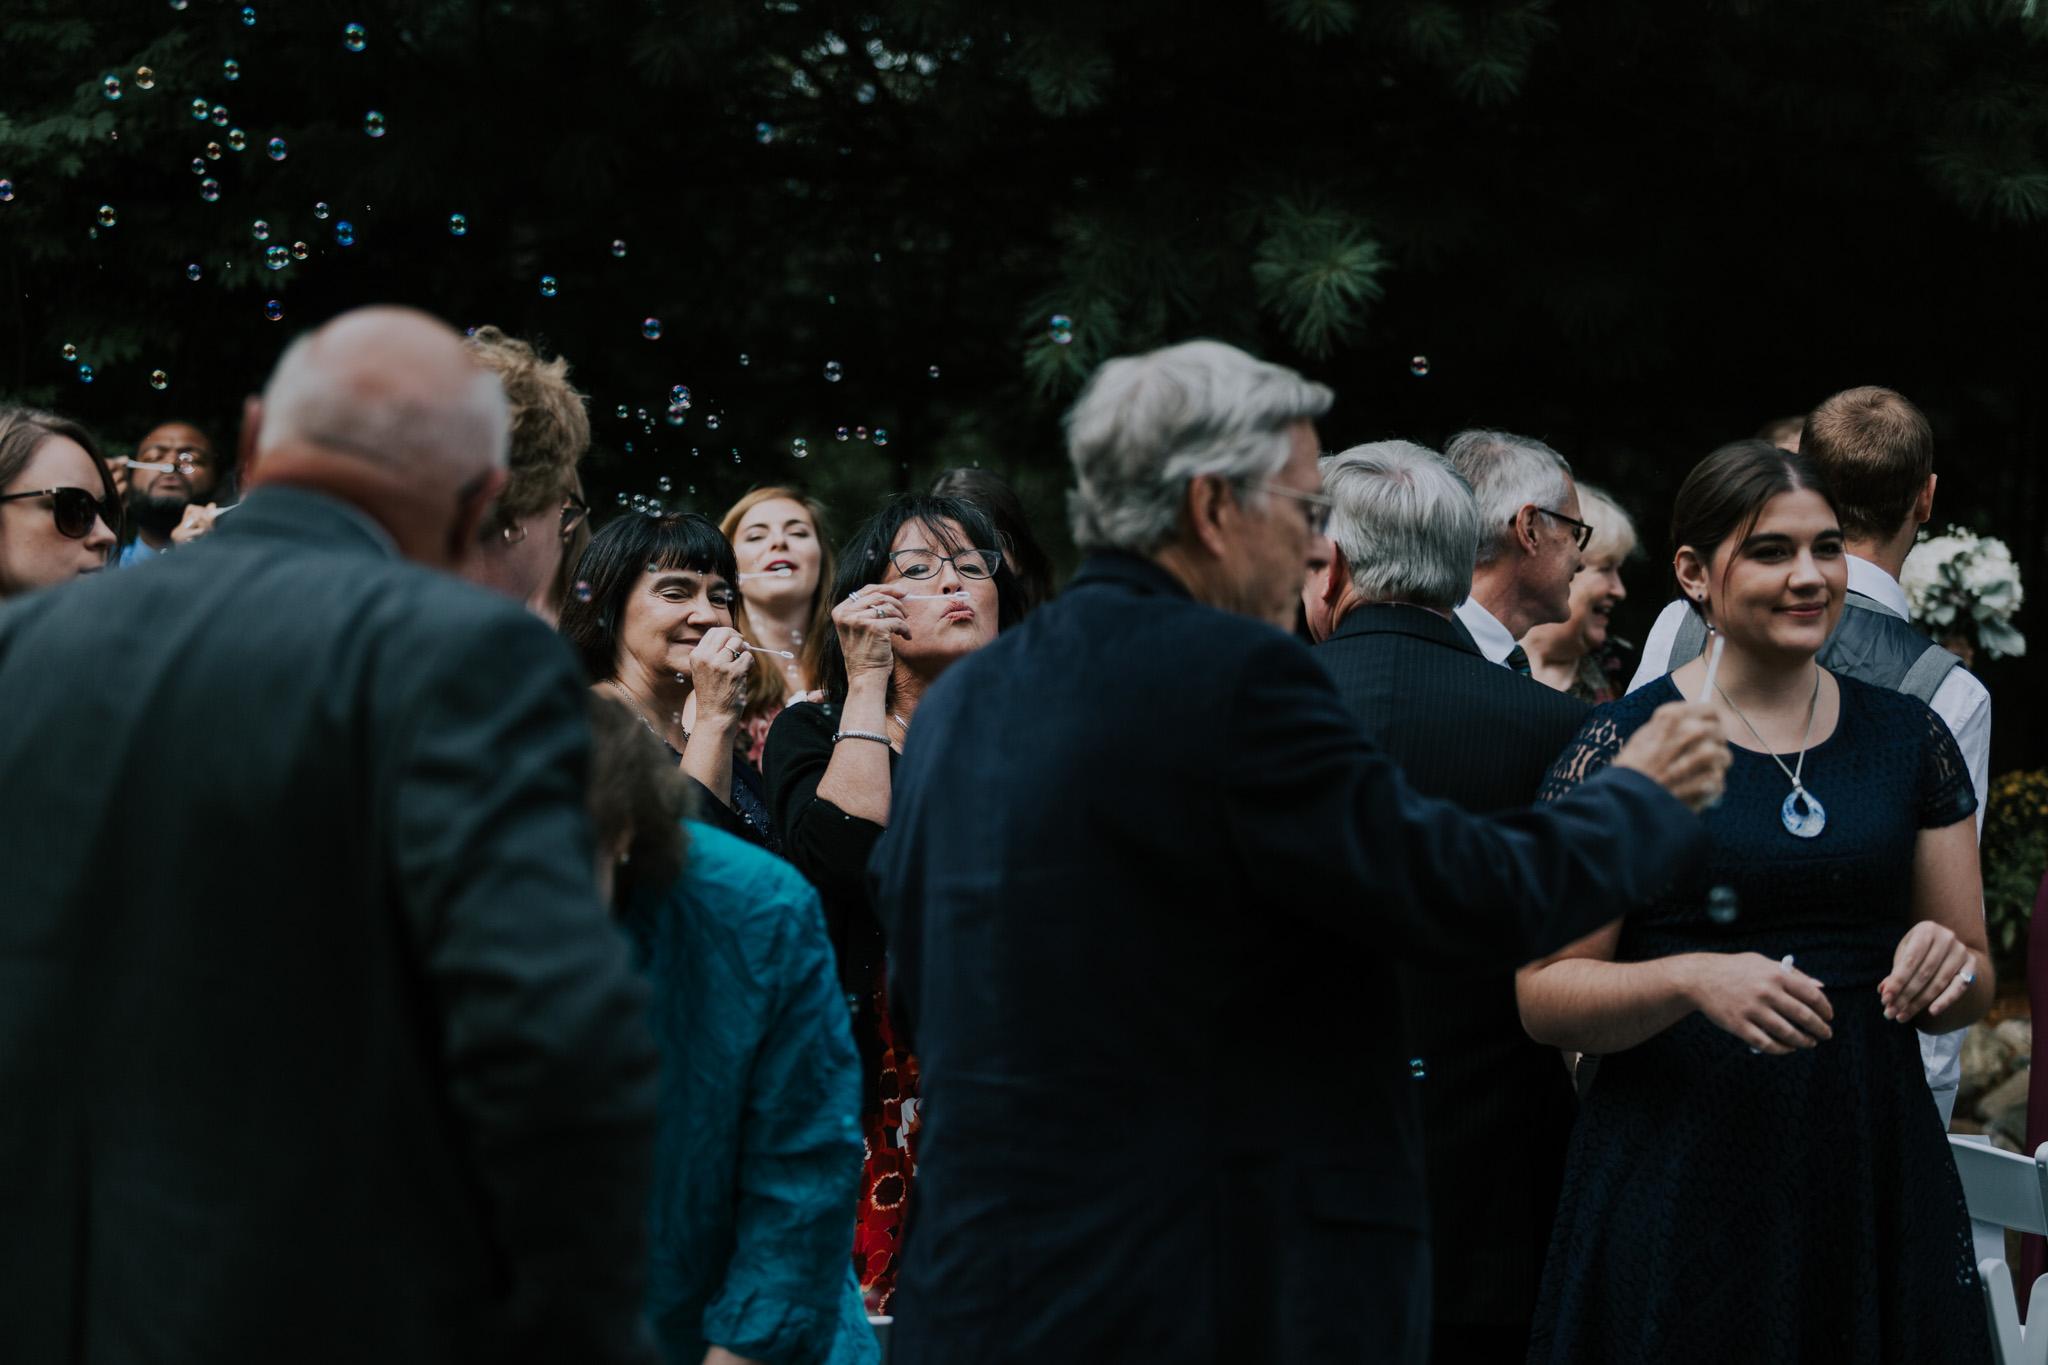 MillCreek-Wilde-Wedding-Barn-Michigan-Eliza-Eric-Vafa-Photo691.jpg